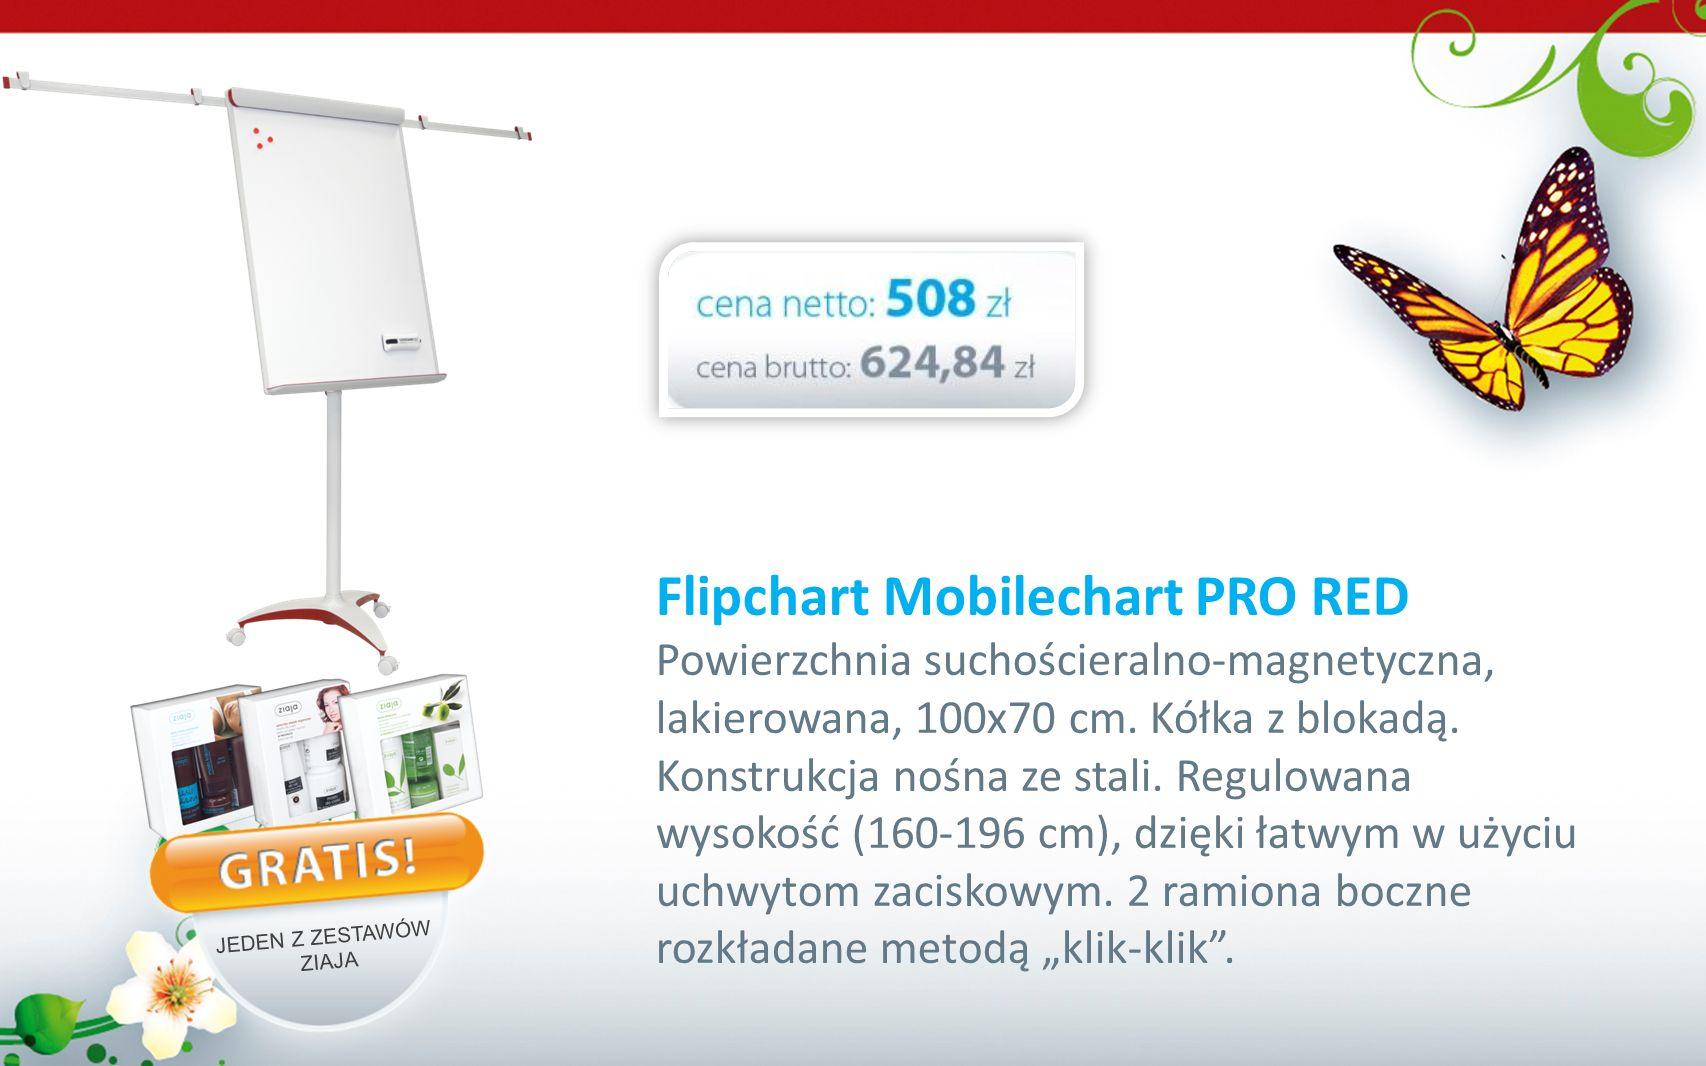 Flipchart Mobilechart PRO RED